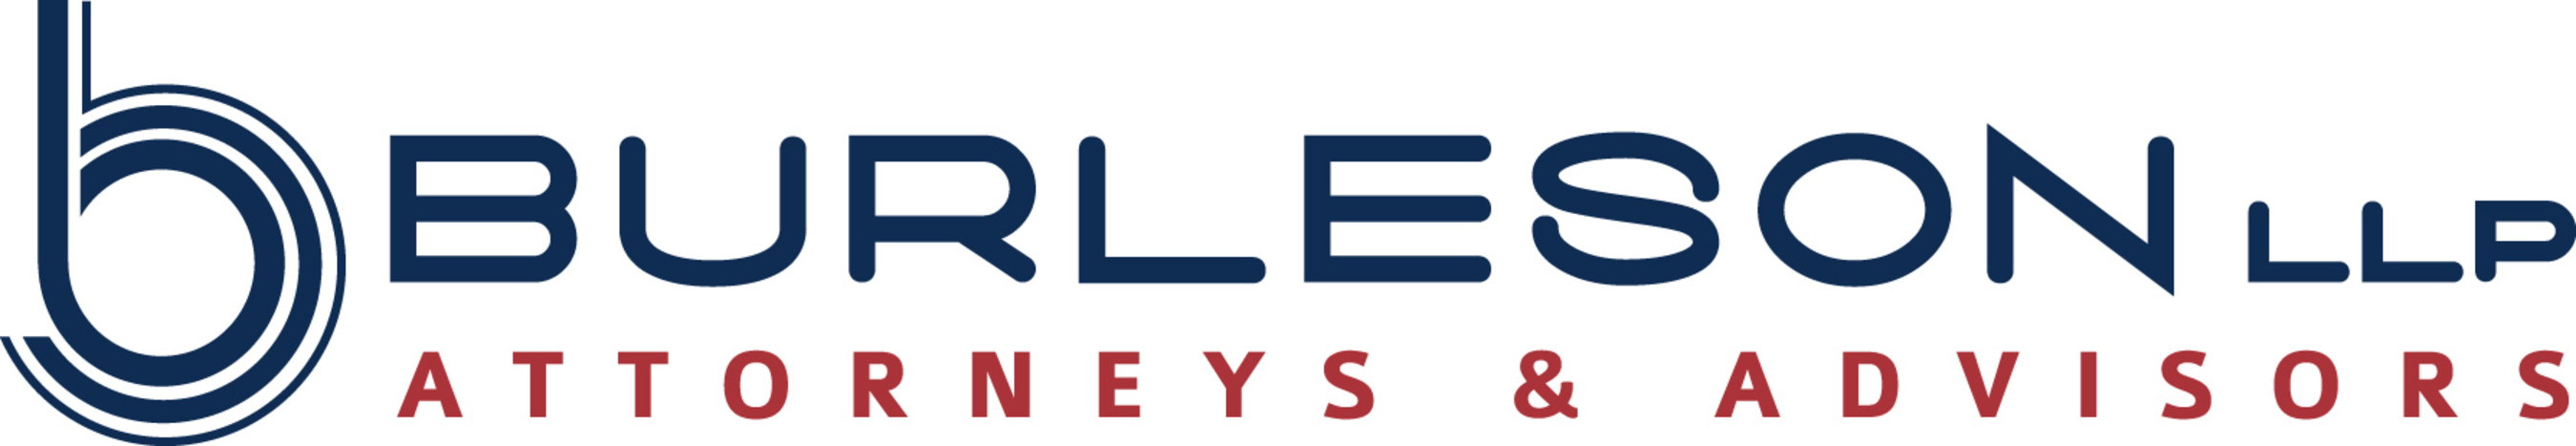 Burleson LLP: Attorneys & Advisors